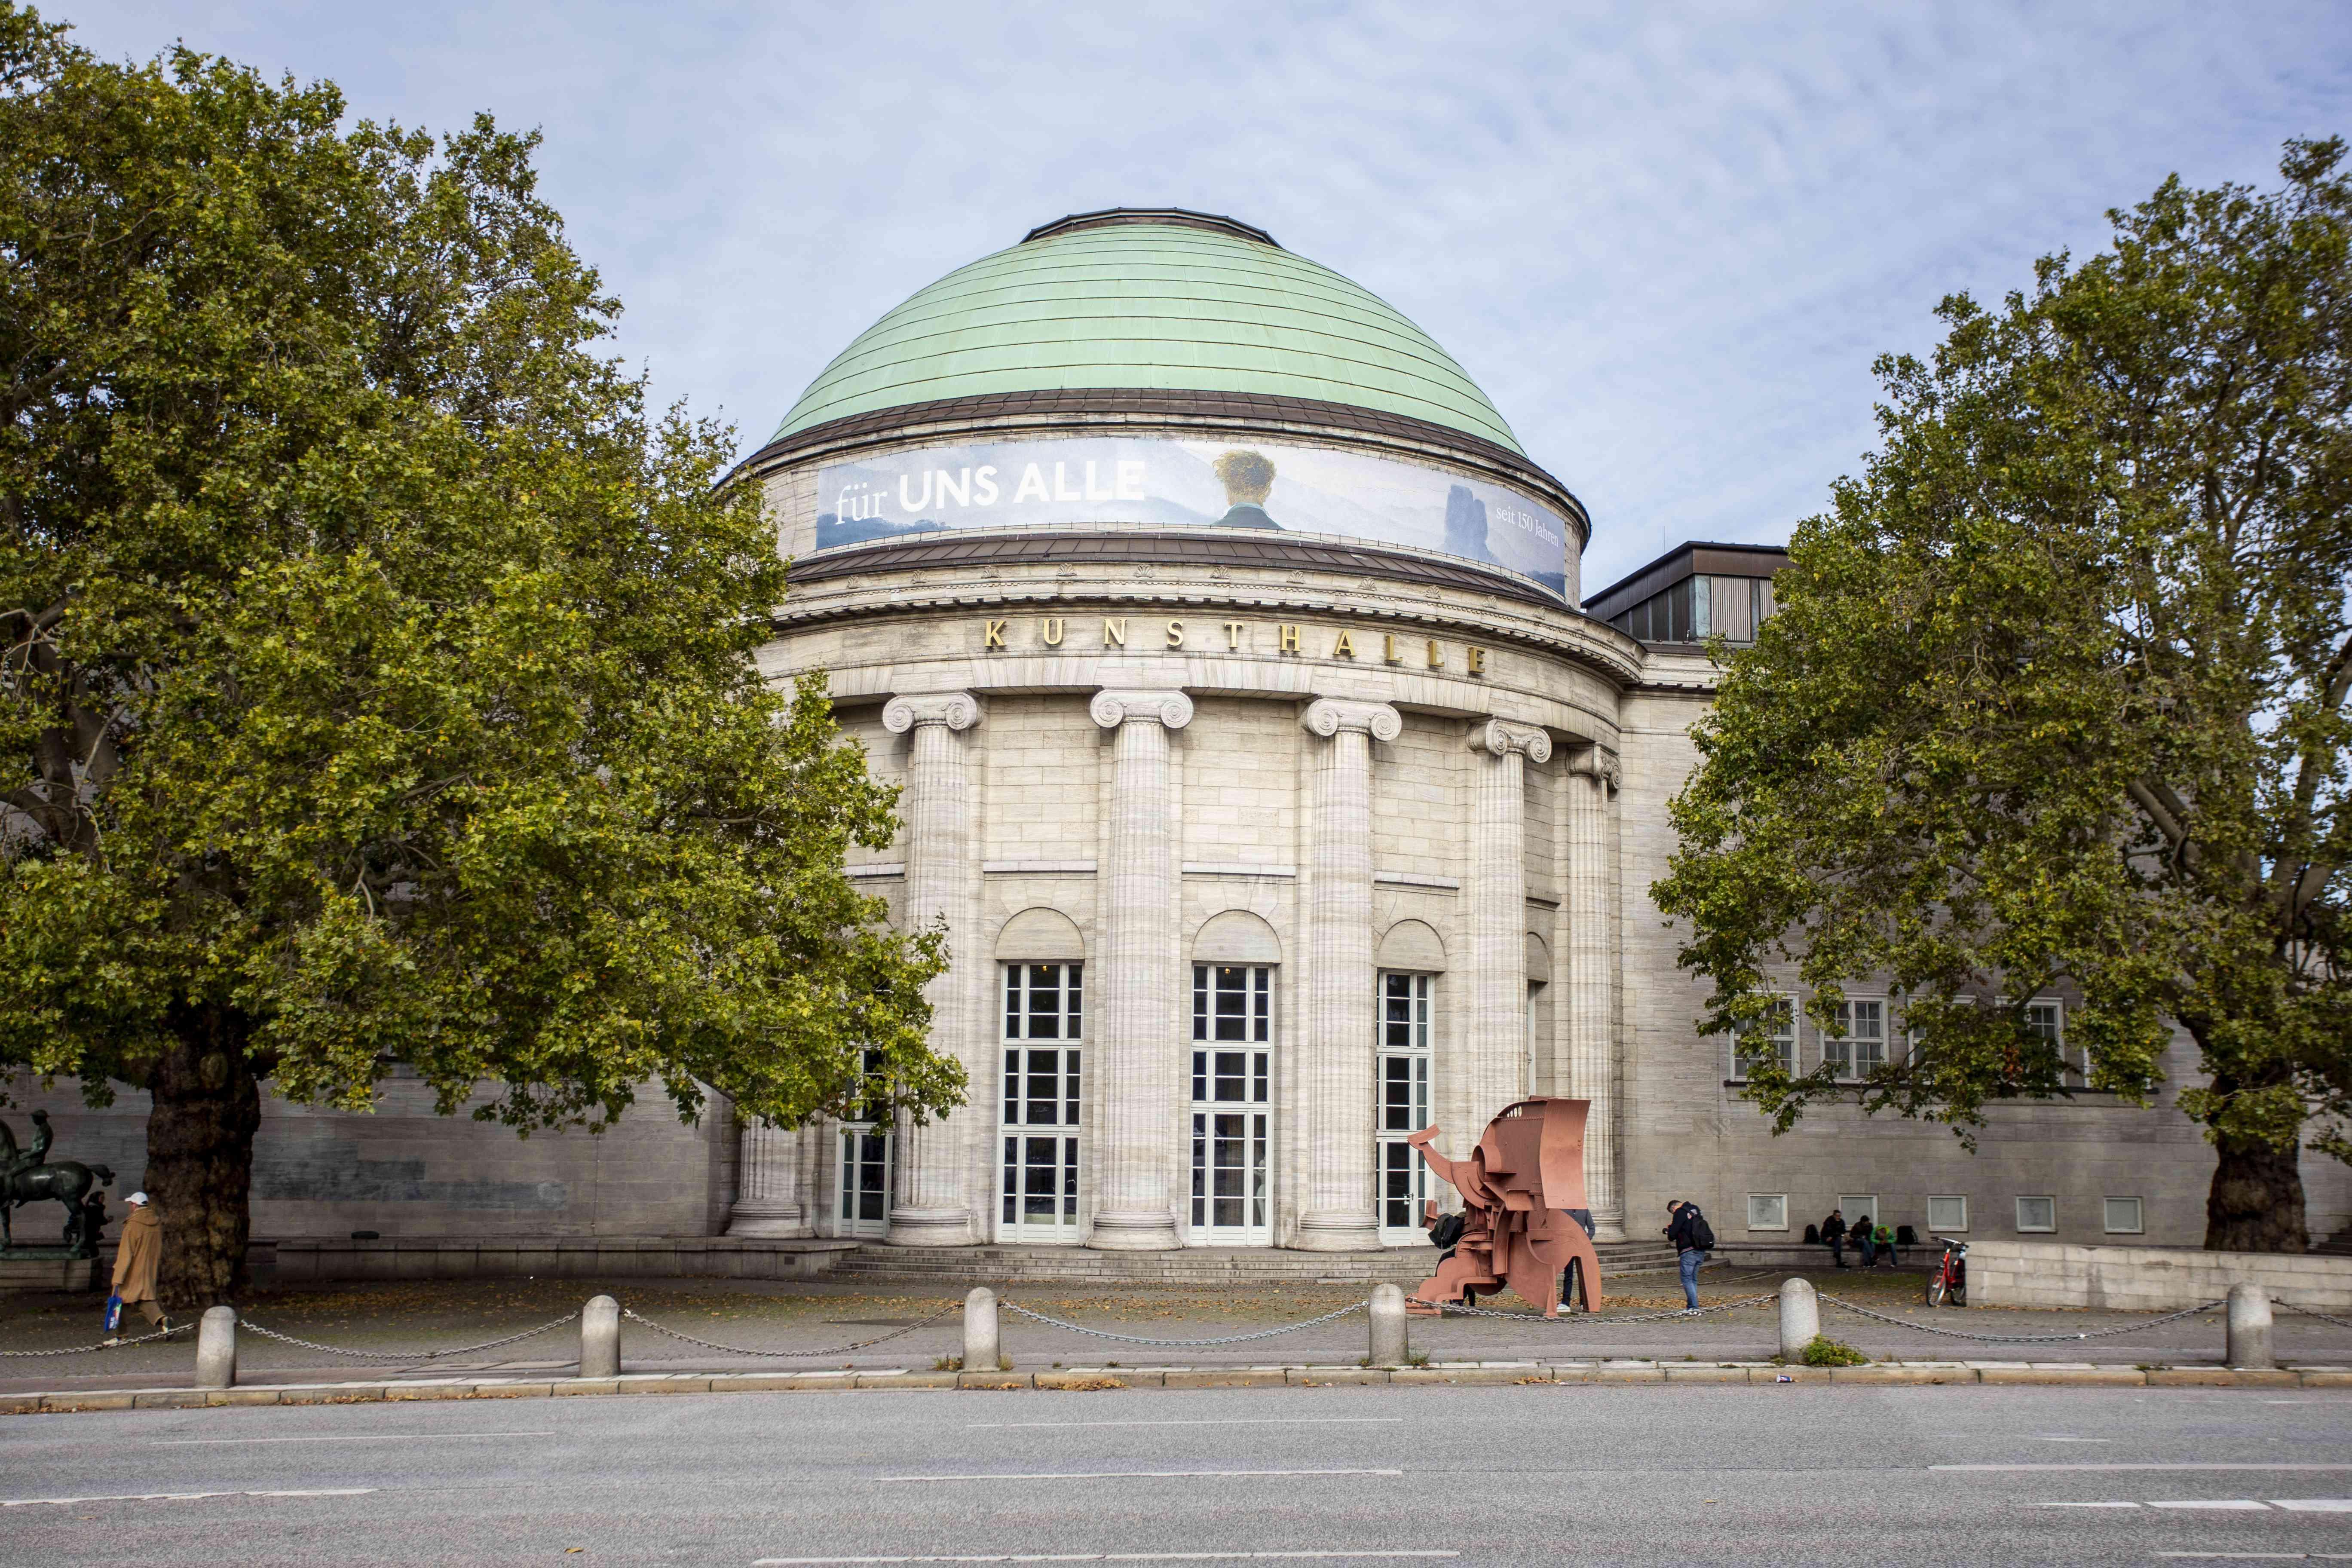 Exterior of the Hamburger Kunsthalle